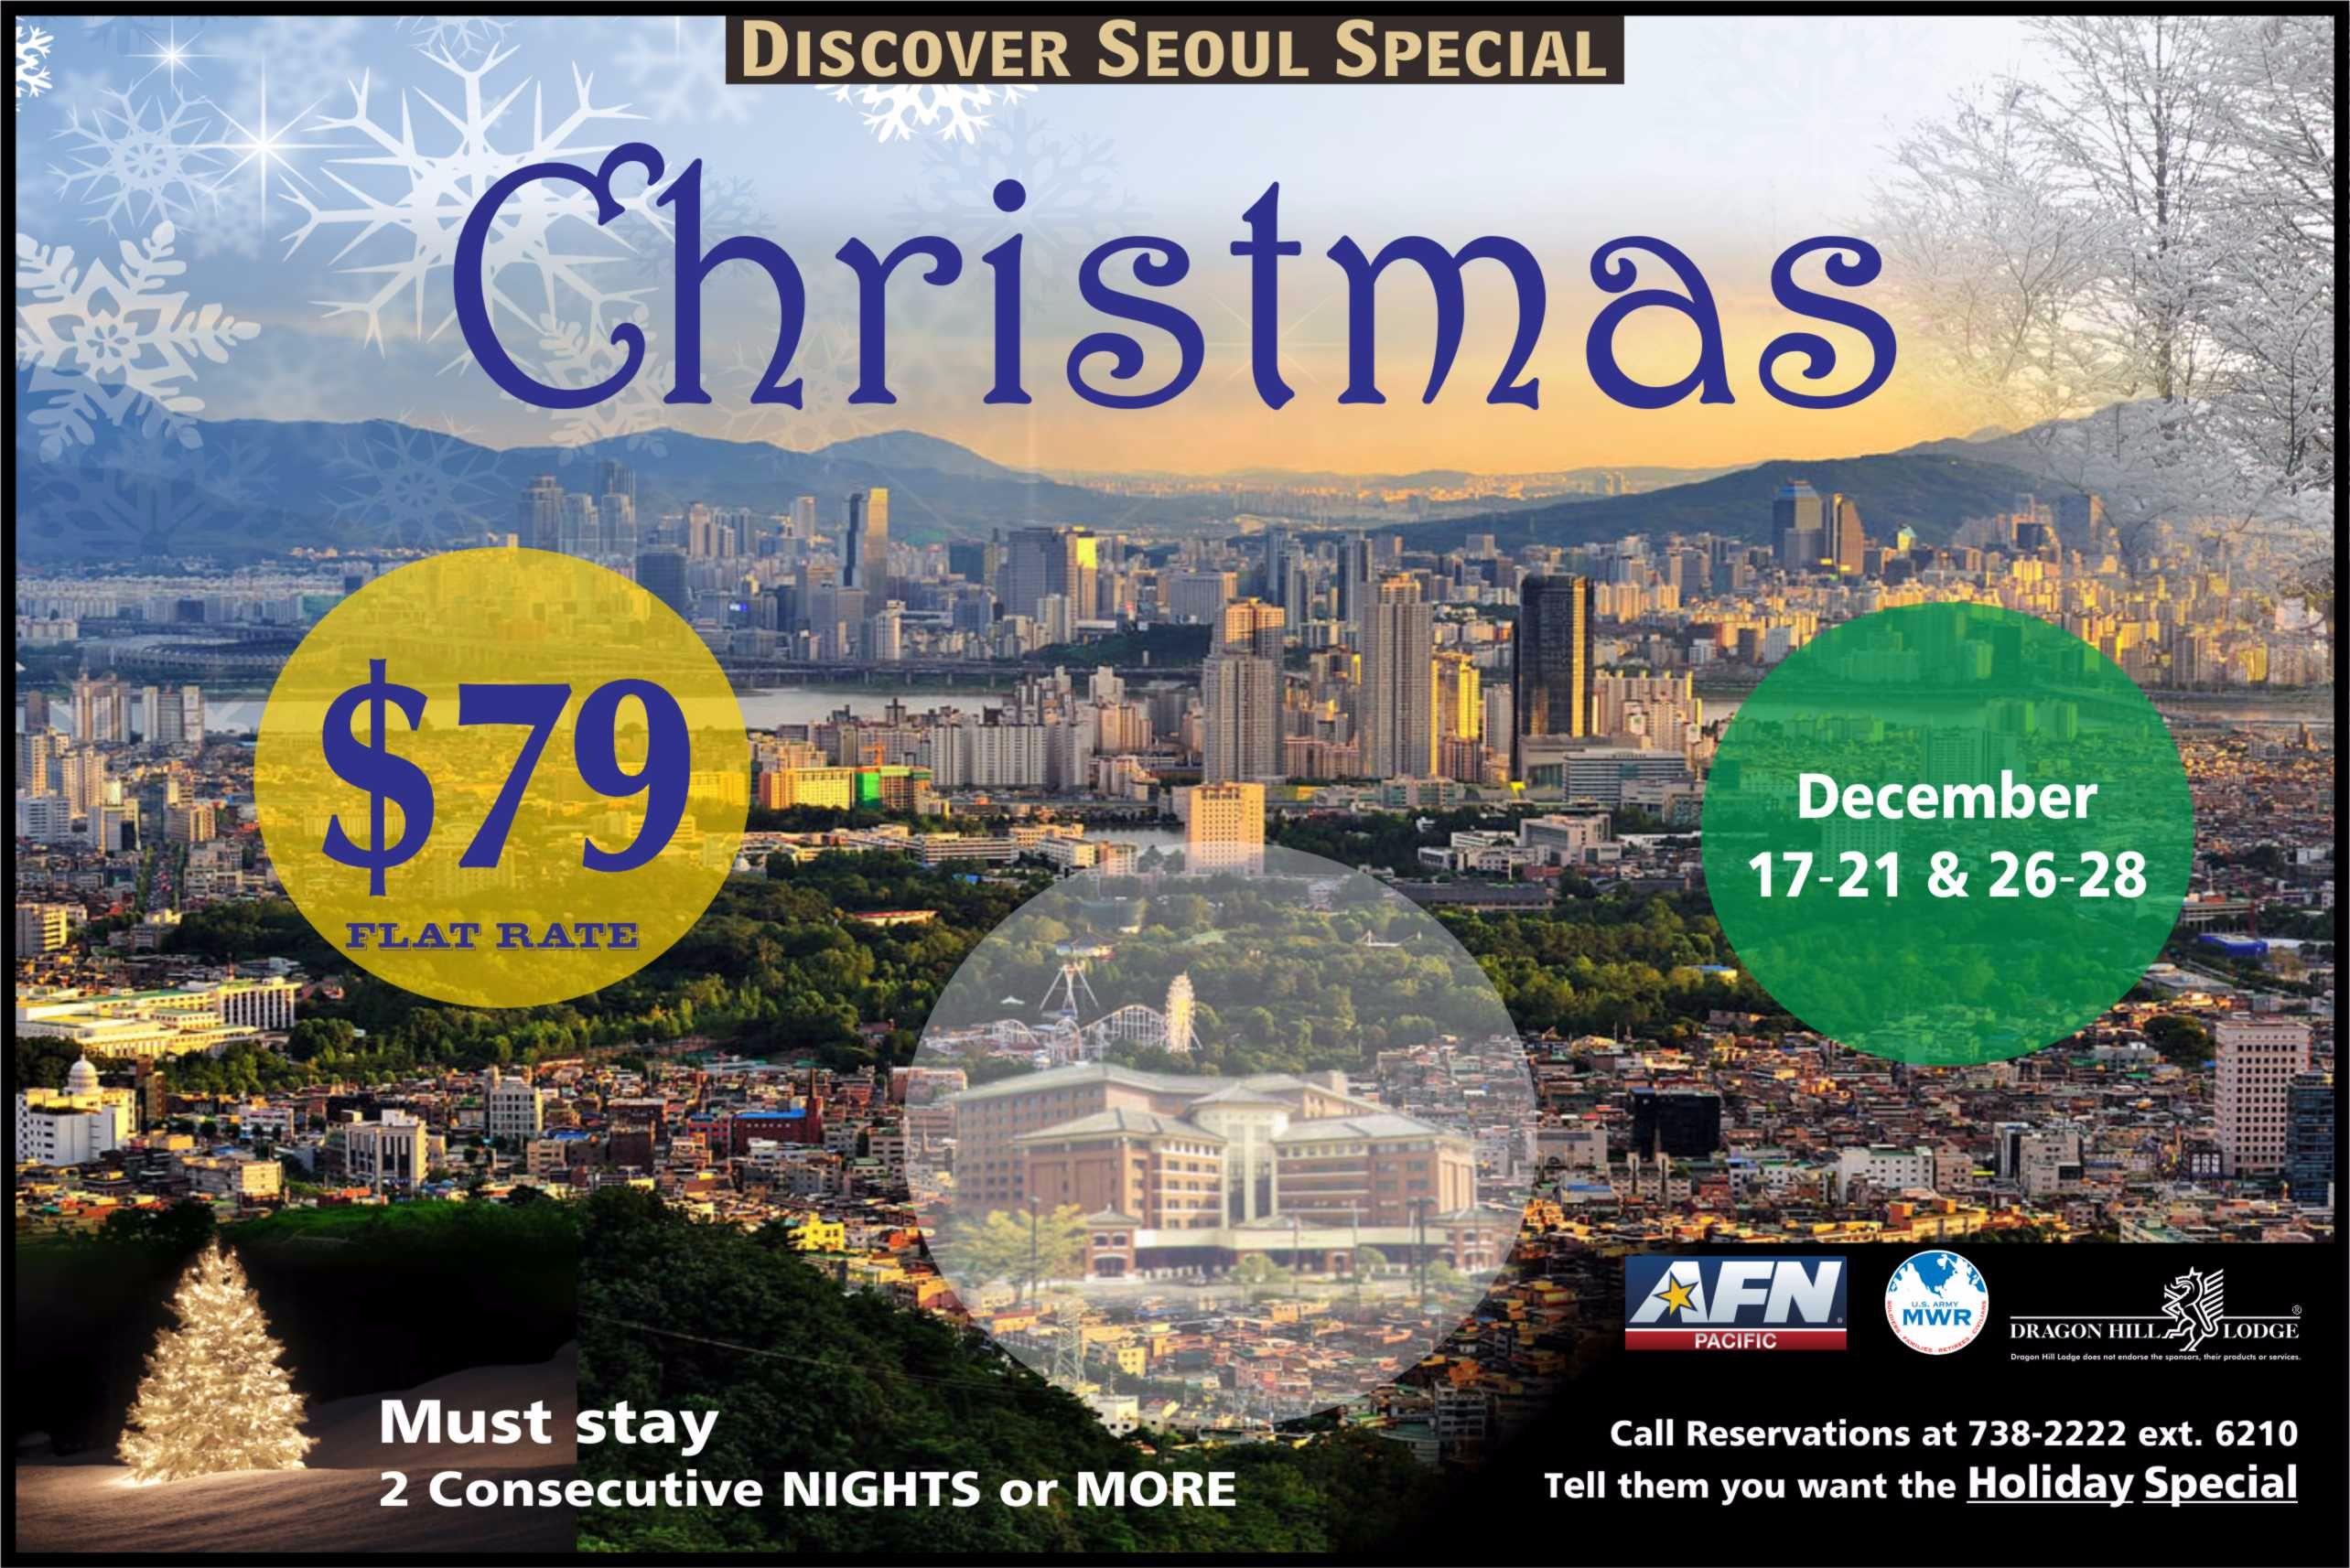 79 Christmas cover.jpg